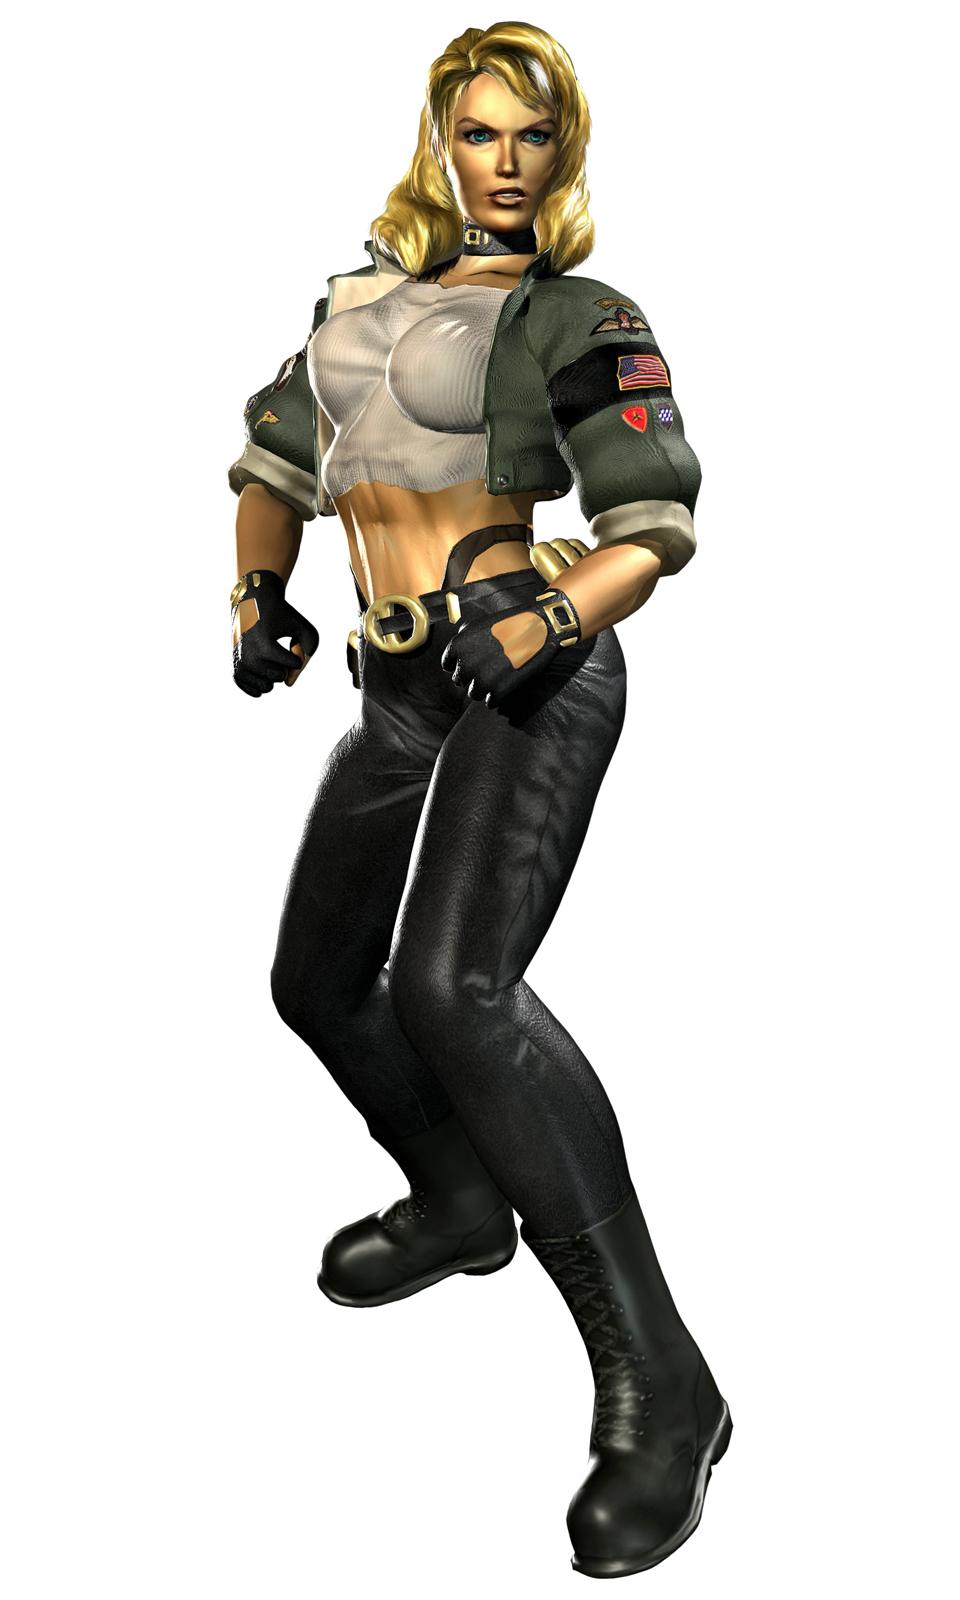 Sonya Blade Mortal Kombat